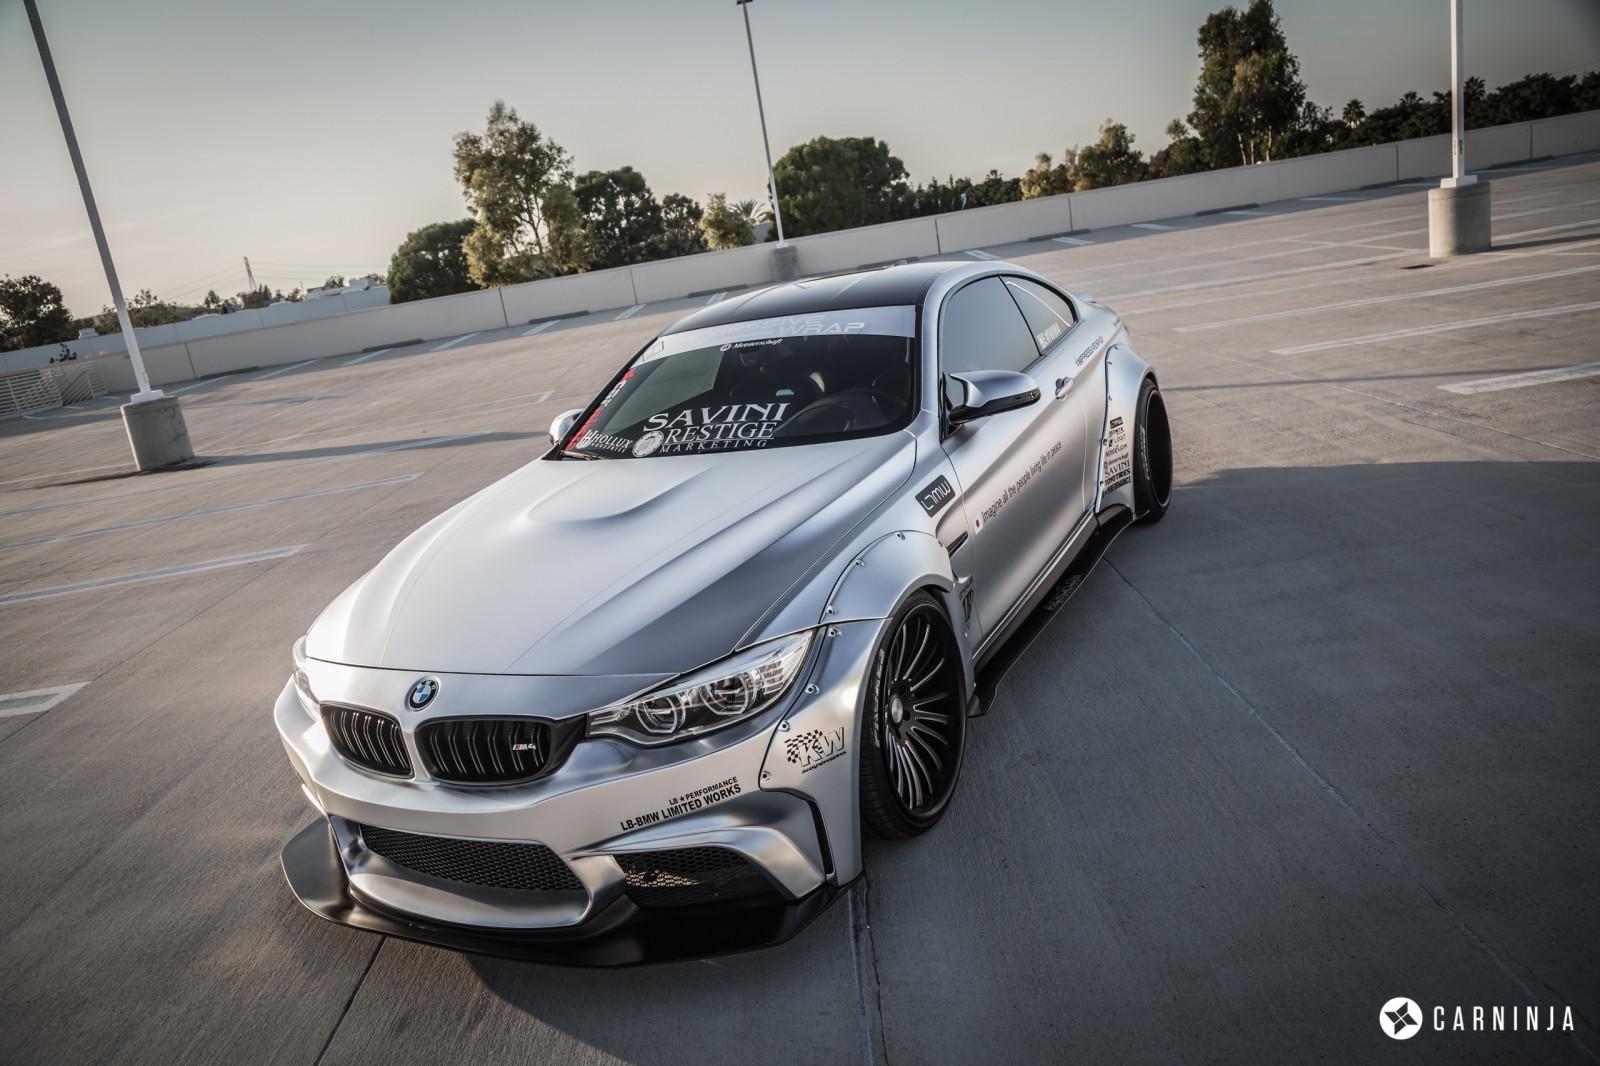 Wallpaper : BMW M4 Coupe, LB Performance, LB Works ...